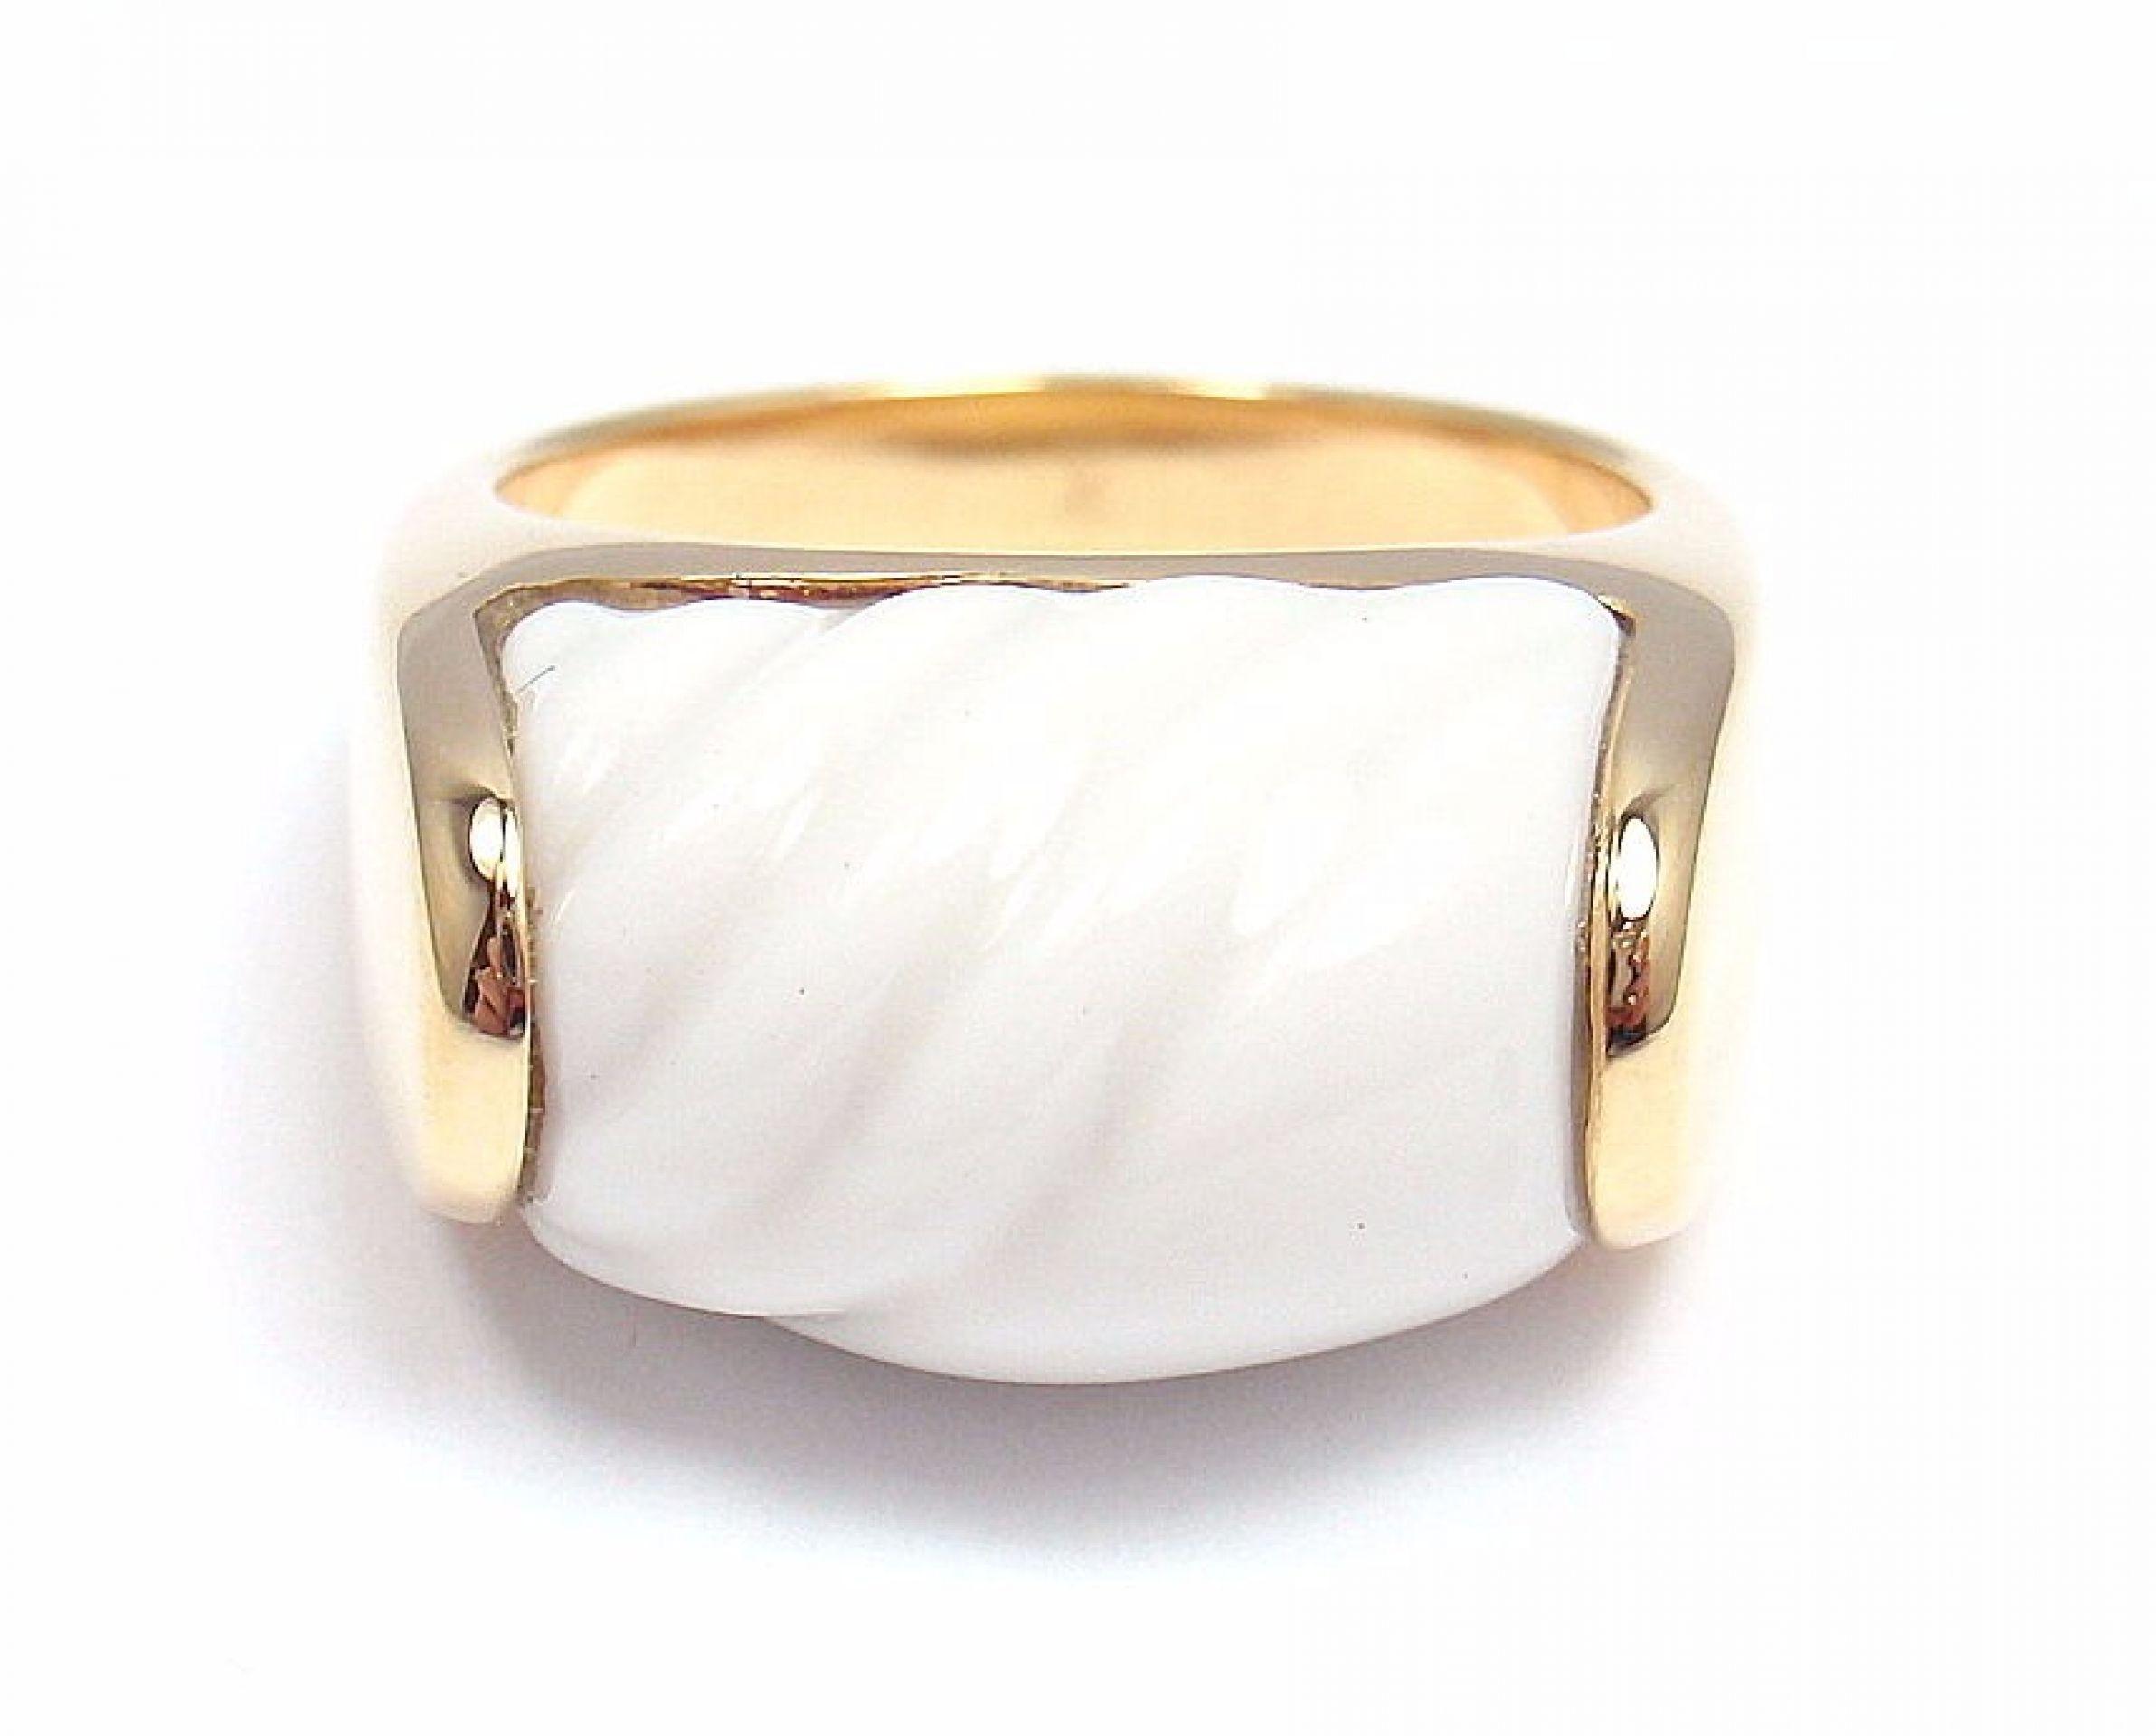 AUTHENTIC! BULGARI BVLGARI 18k YELLOW GOLD CARVED CERAMIC RING, SIZE 5.75